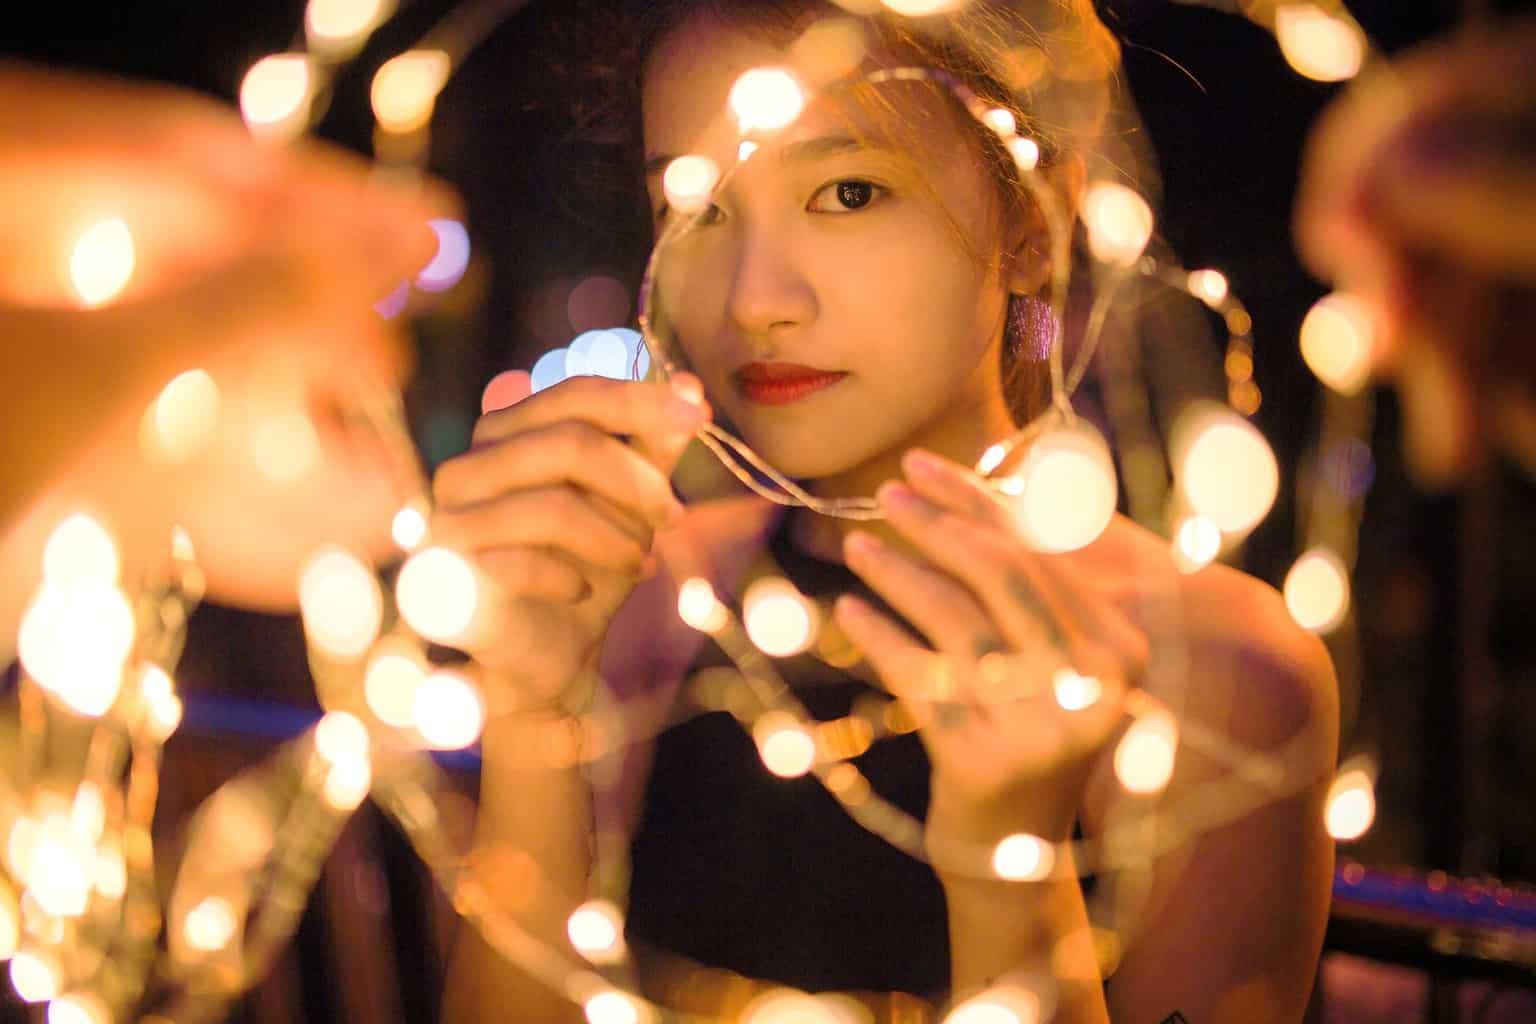 Woman wondering how long do led lights last on batteries